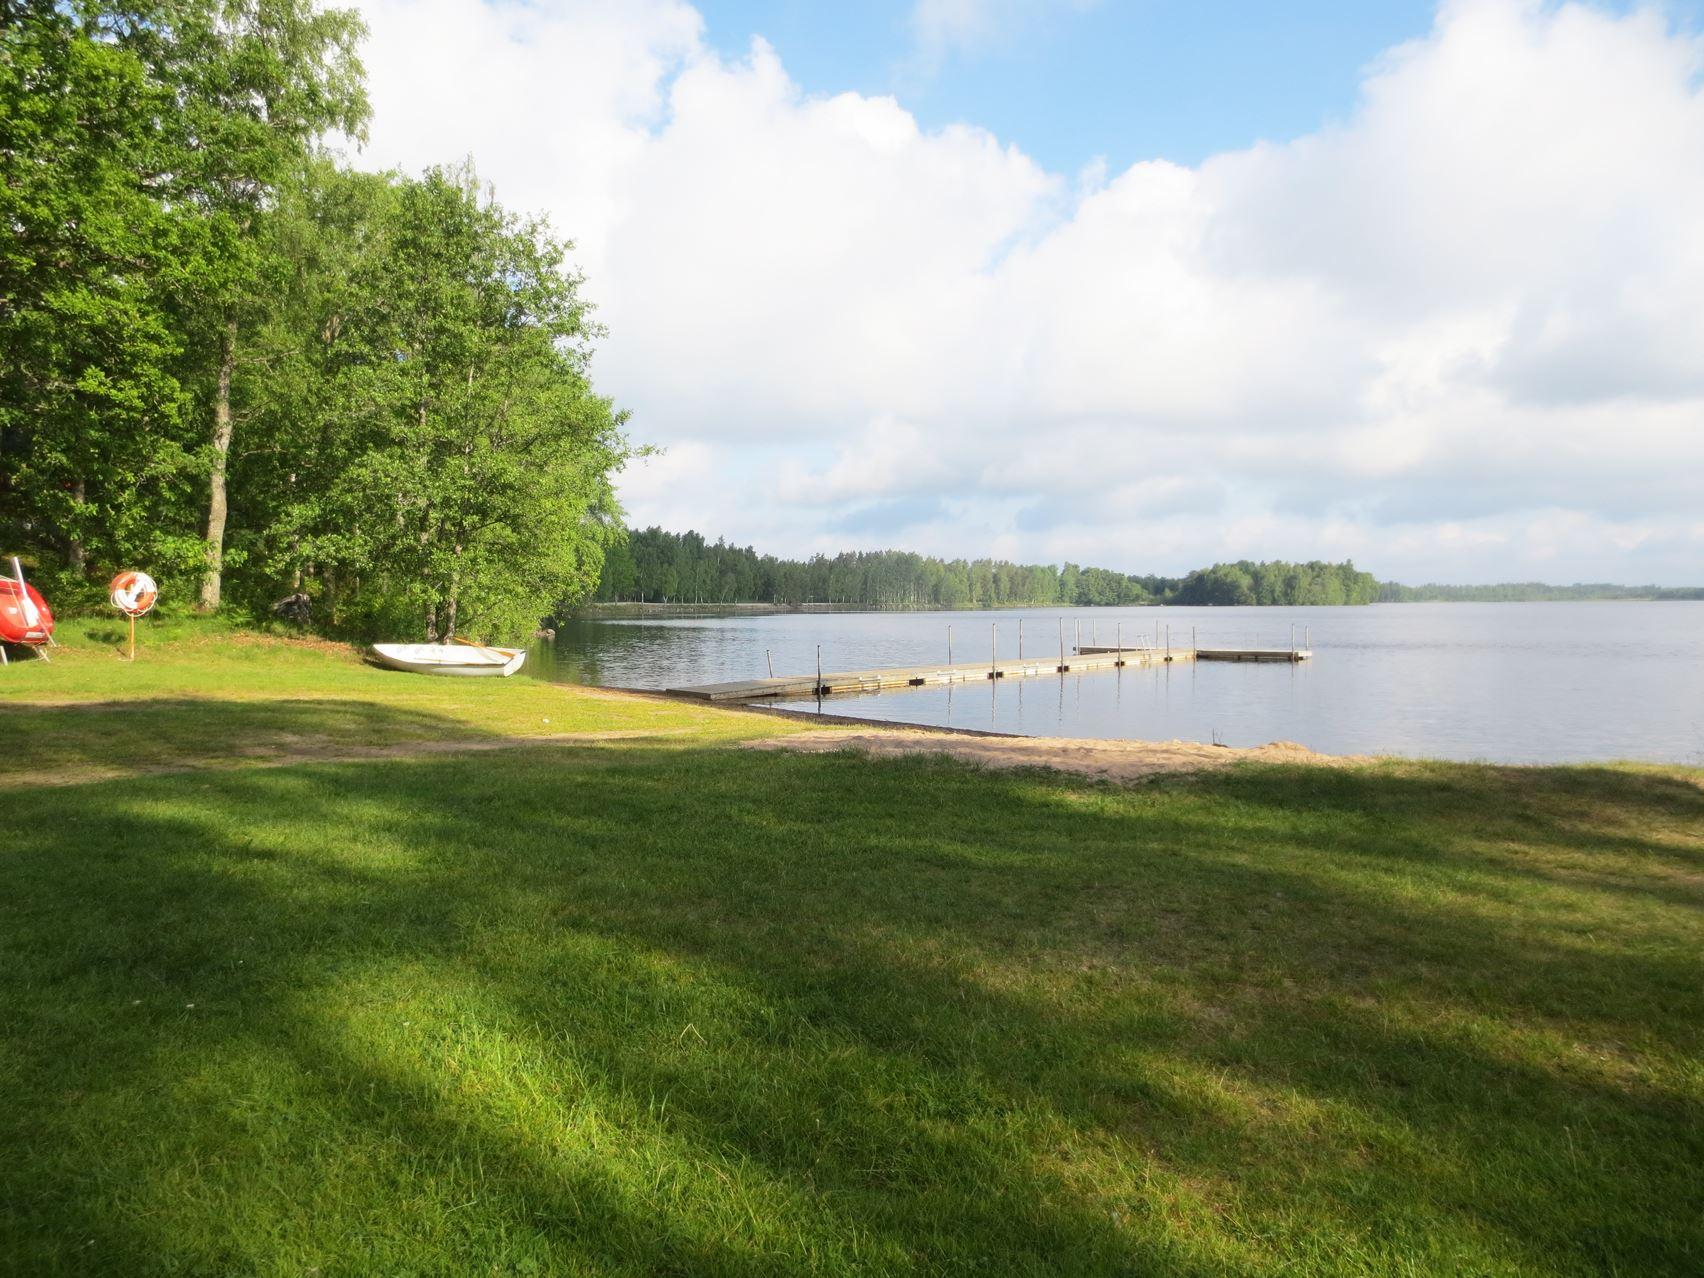 Bathing place: Sikabacken